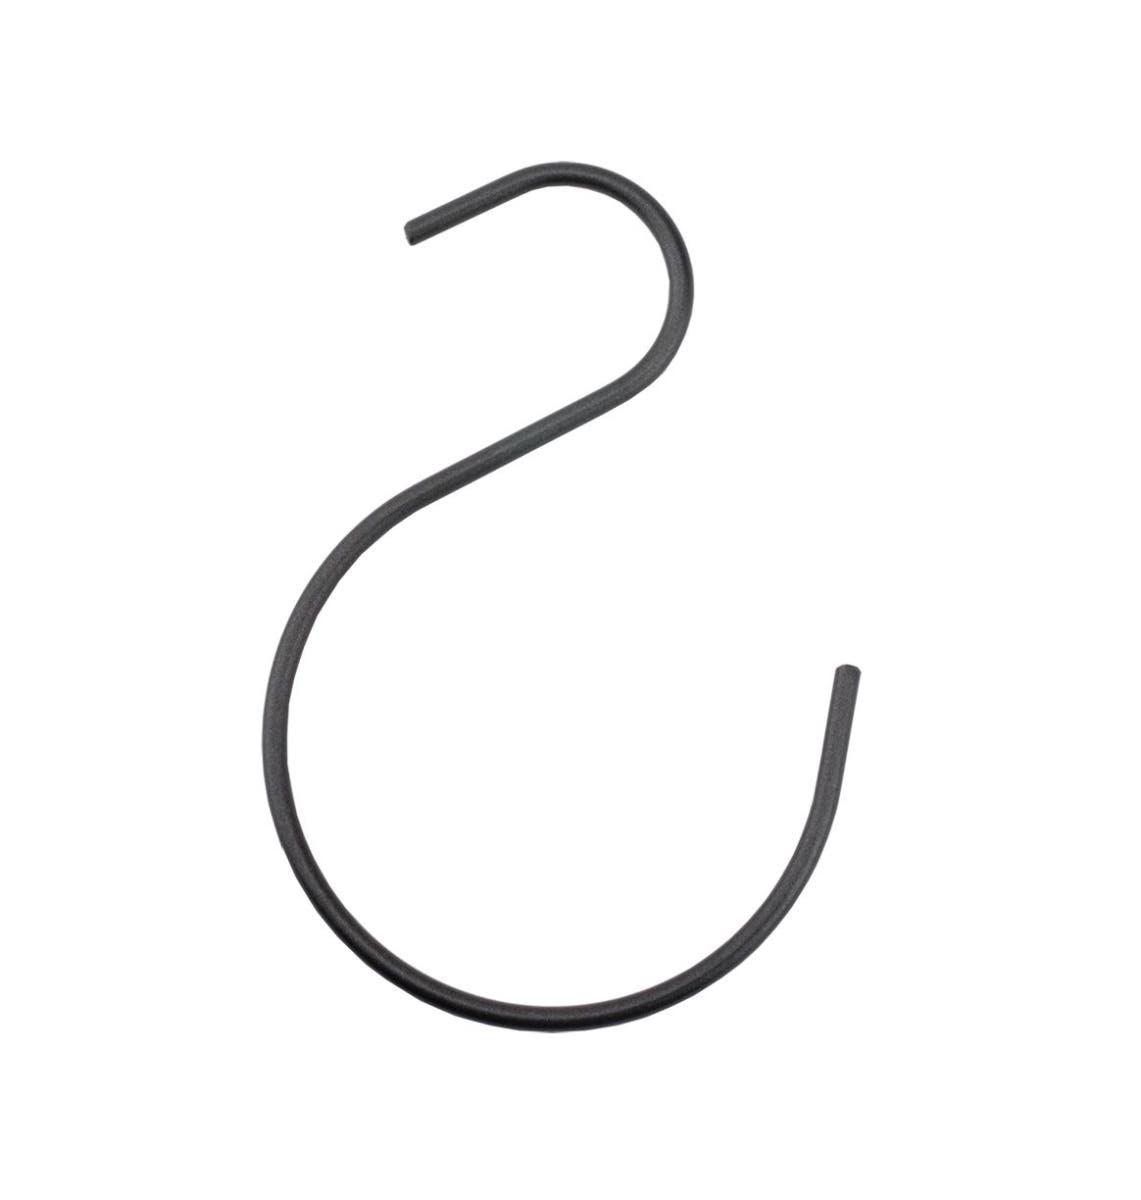 "Jeans Hooks - 7"" Gunmetal - 12 Count"